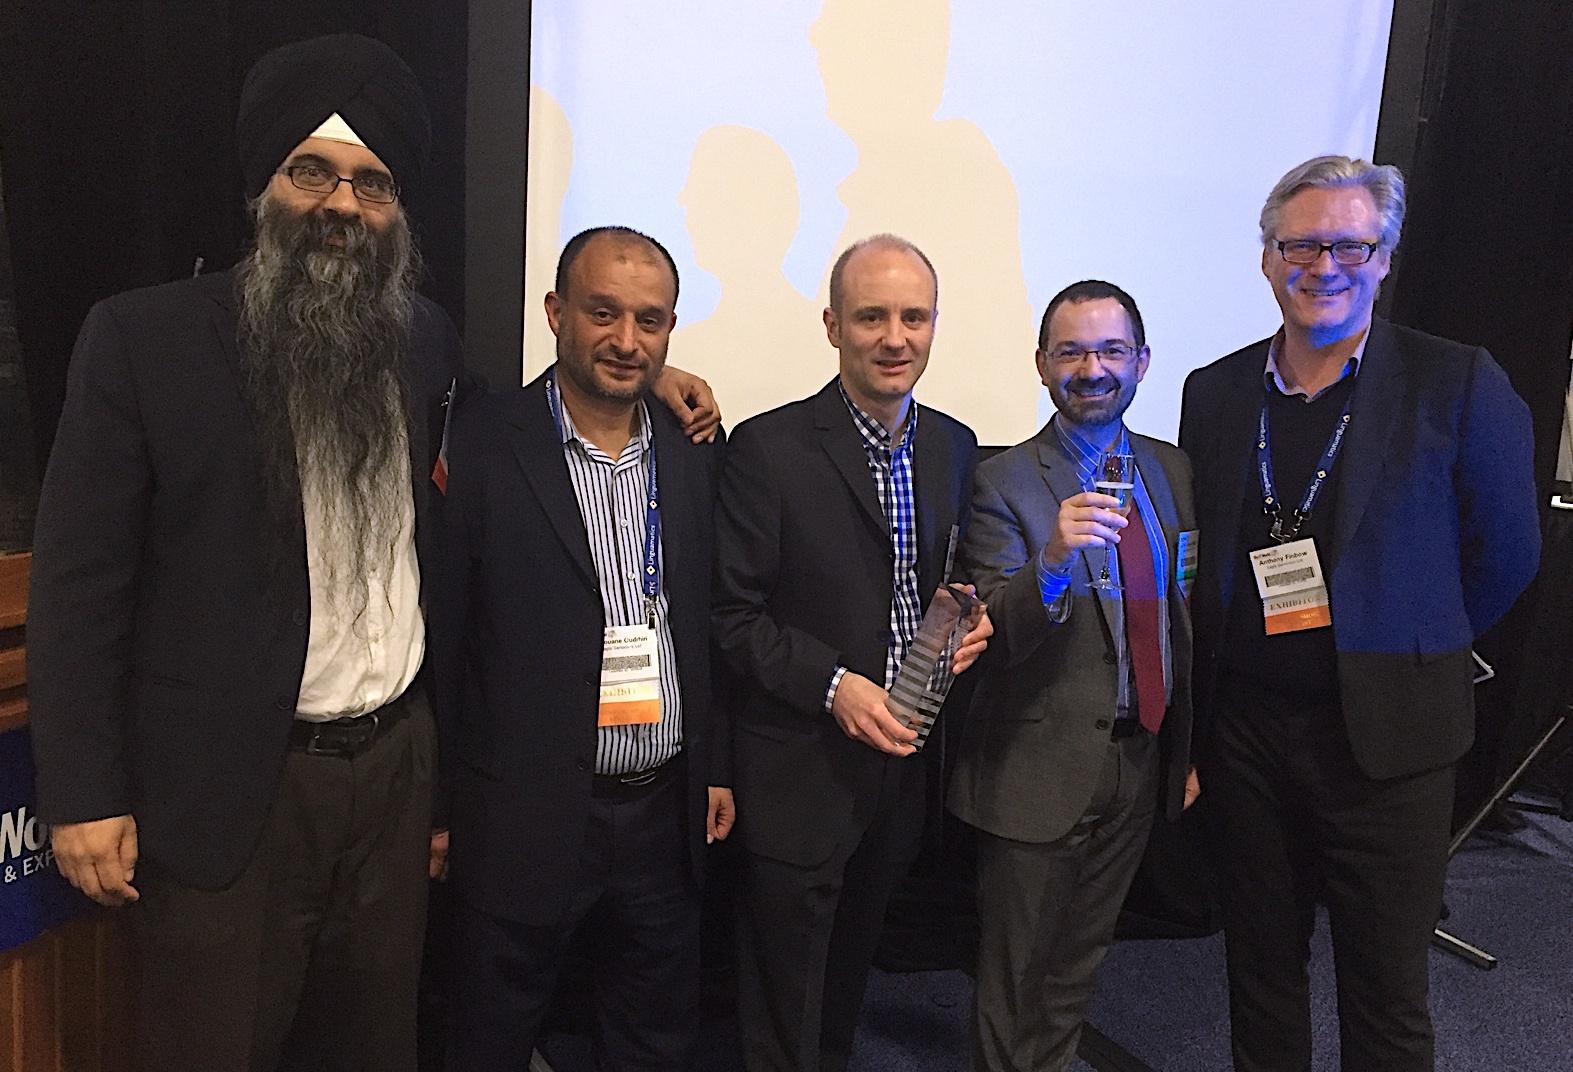 With BioIT Award